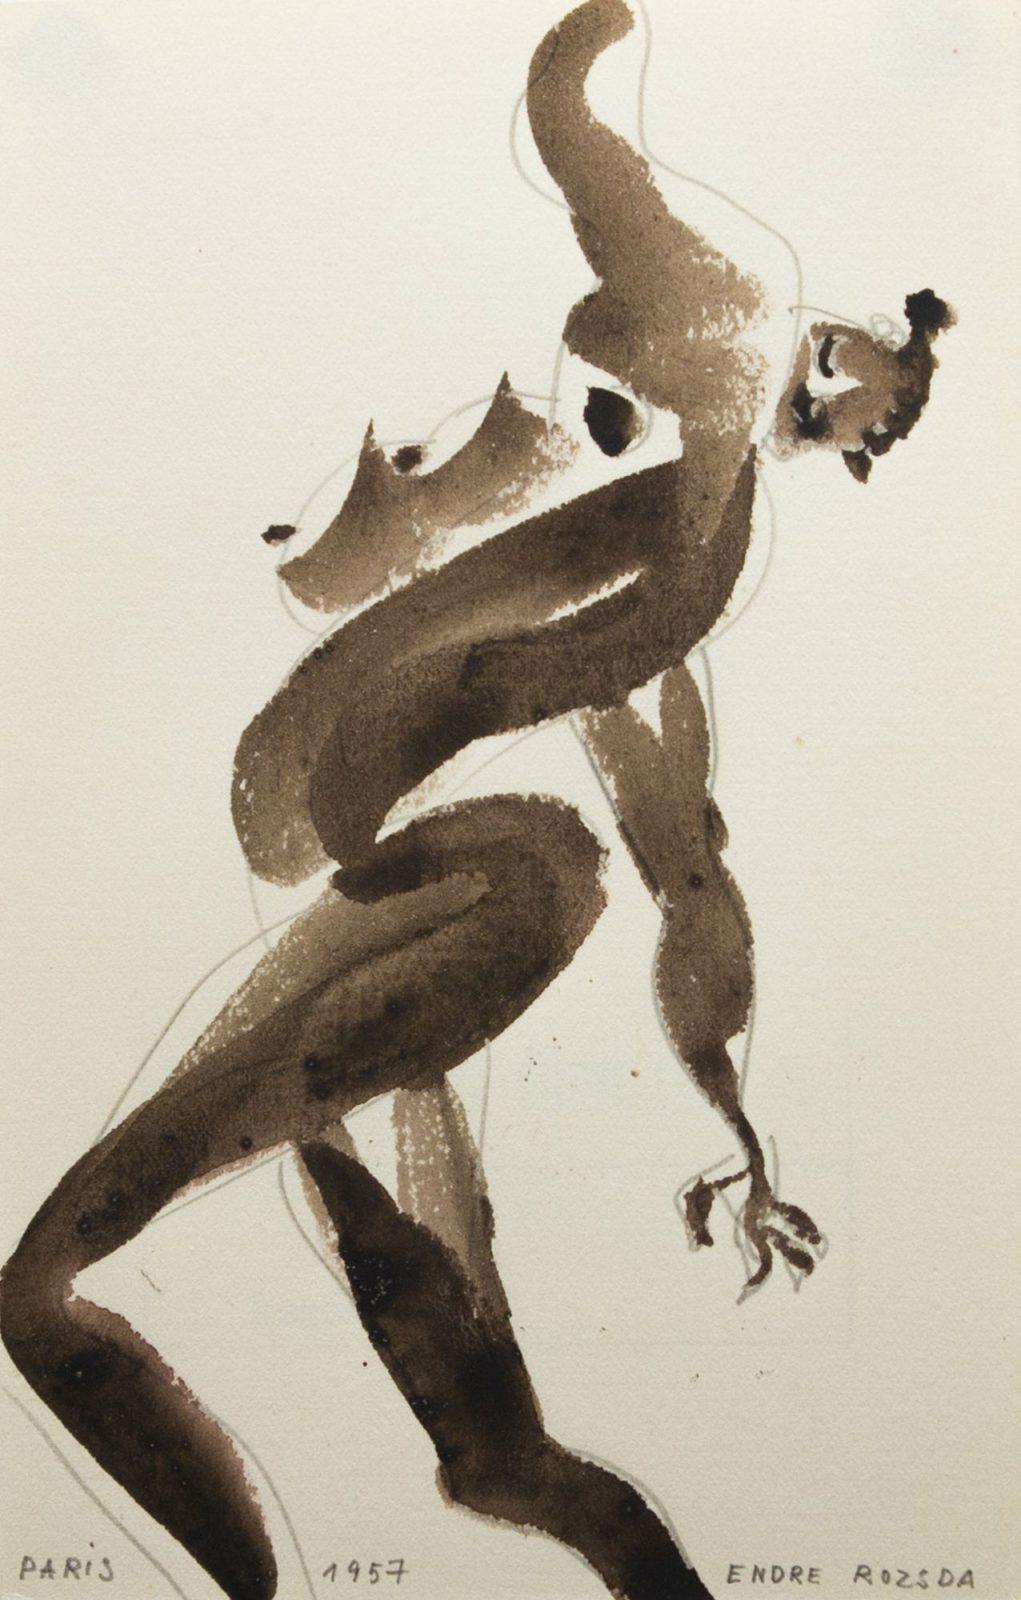 Endre Rozsda: Watercolour III.